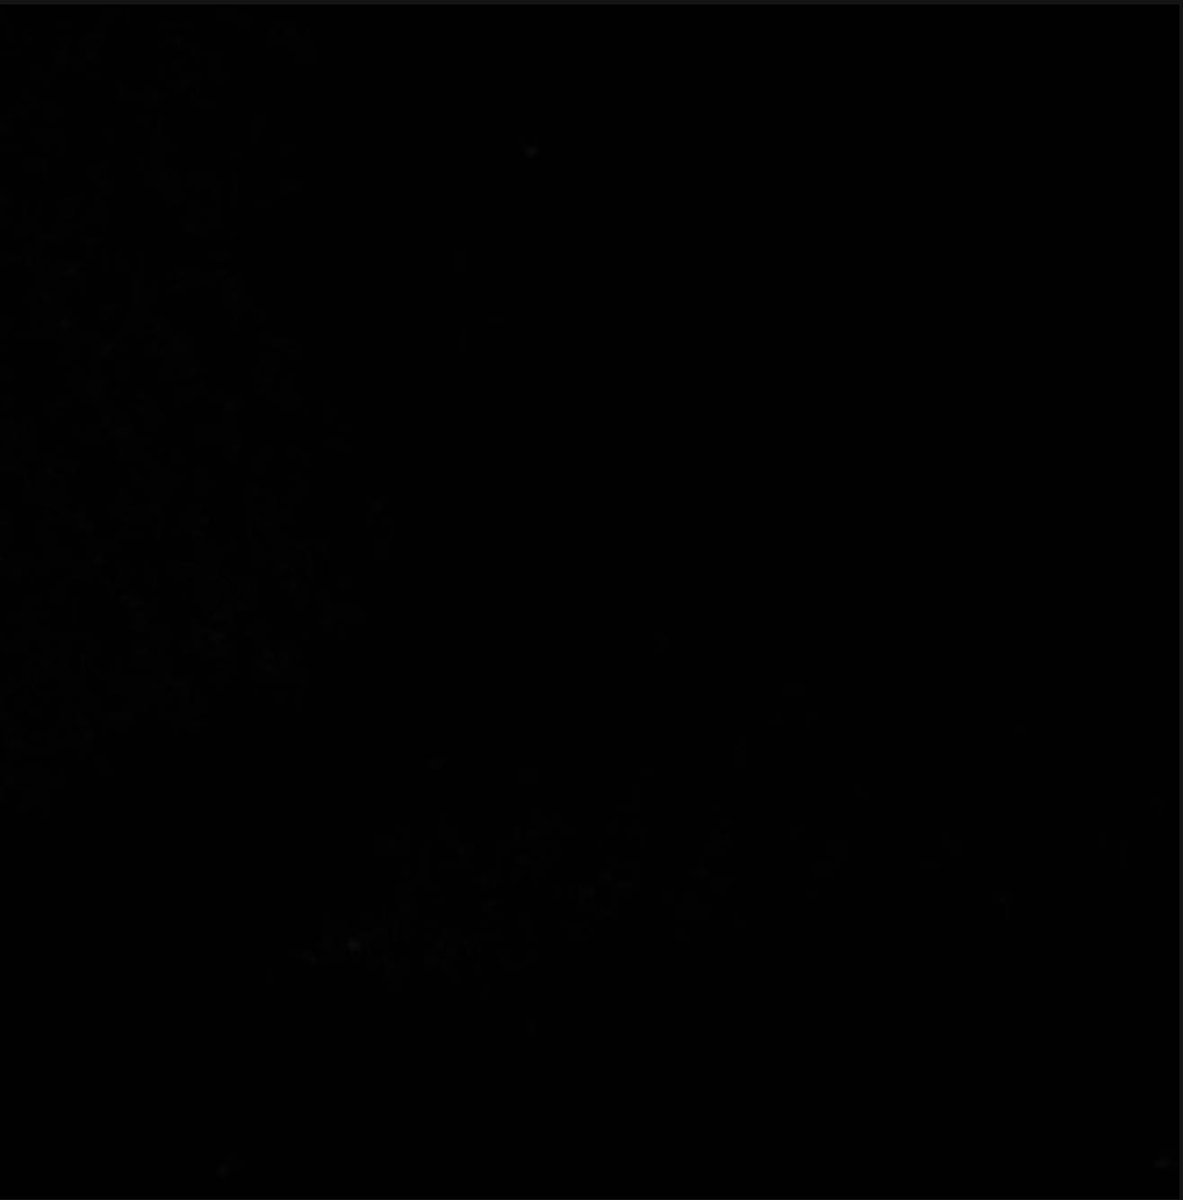 COMING APRIL 24th to ALL STREAMING PLATFORMS!! #SMWP #PhoenixHarinko #clockworkmgmt #music #genre #song #songs #HashTagPost #melody  #instagood #newsong #photooftheday #repeat #brokendrum #Harinko #goodmusic #instamusic #artist #brokendrum #424 #spotifycanada #googleplaymusicpic.twitter.com/KWpbAc0HYA